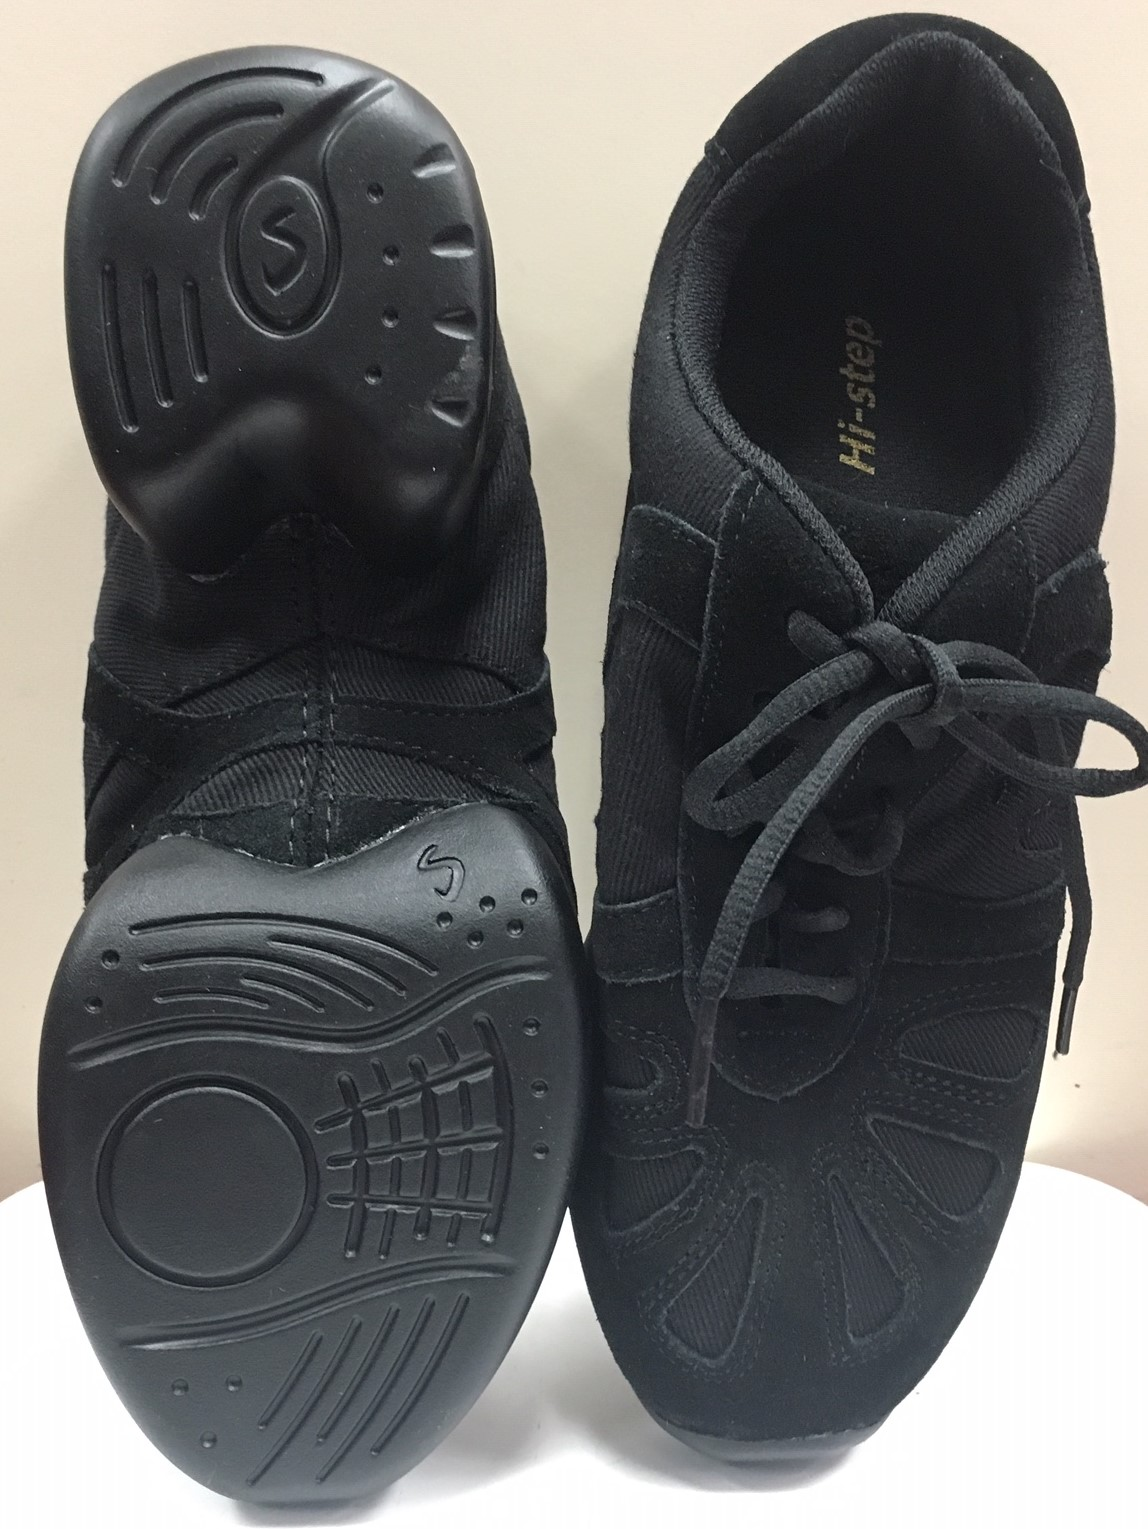 Sansha Cushioned Sole Dance Sneakers